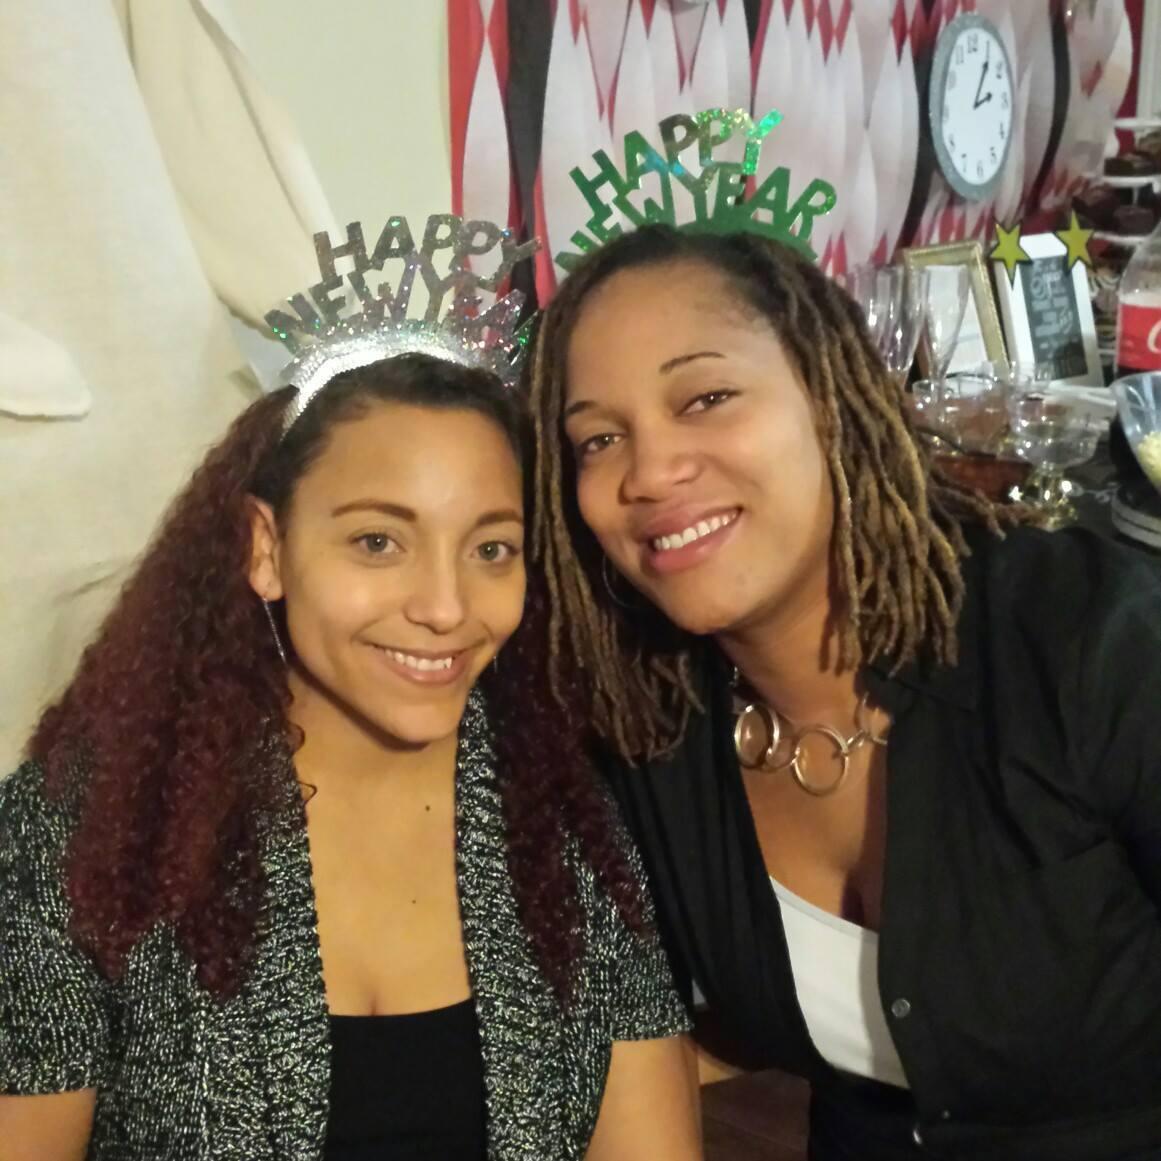 "Two girls celebrating New Years """